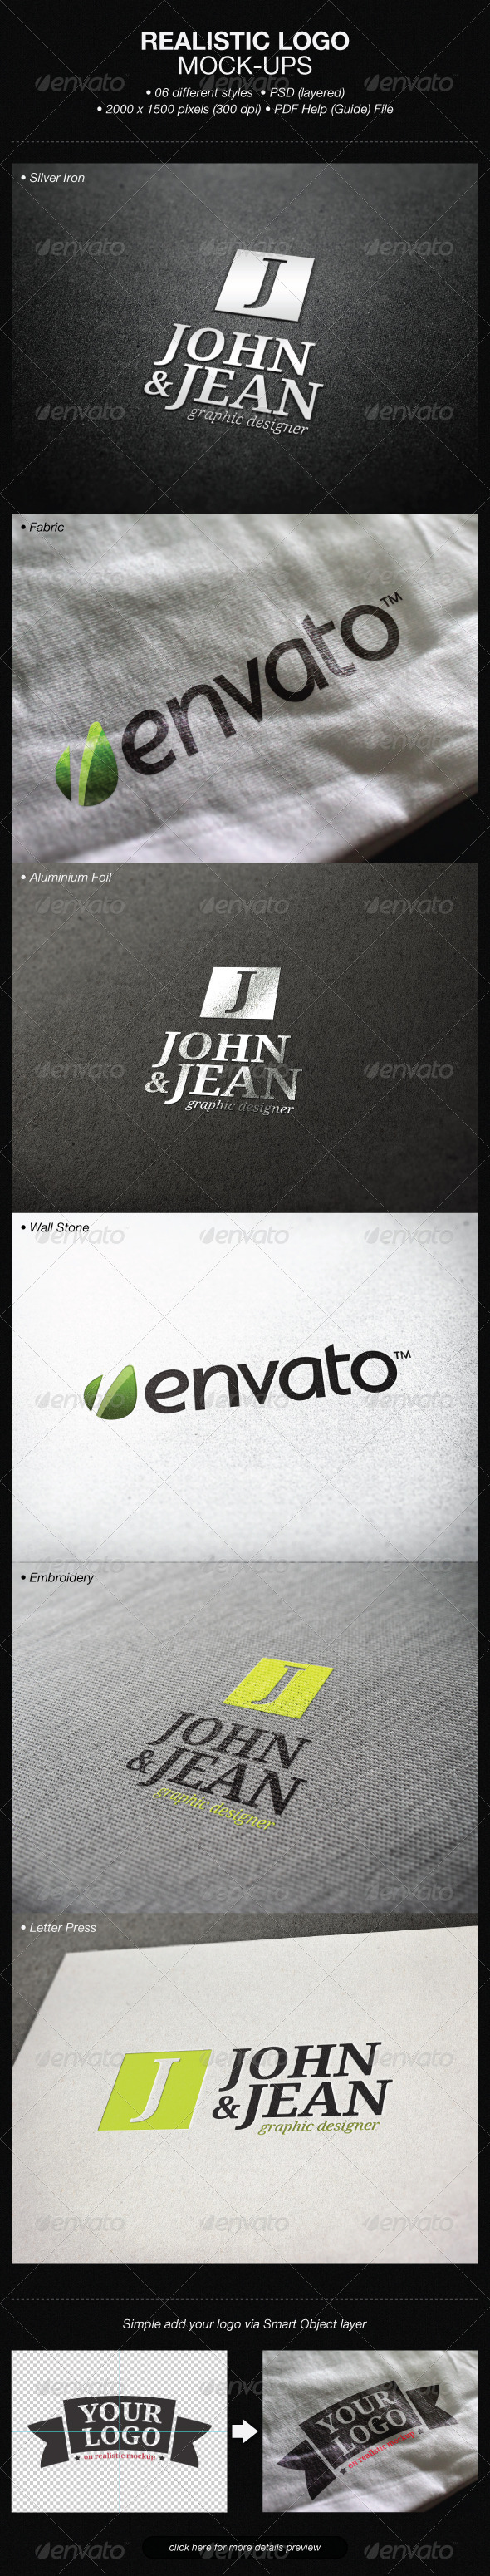 Realistic Logo Mock-ups - Product Mock-Ups Graphics